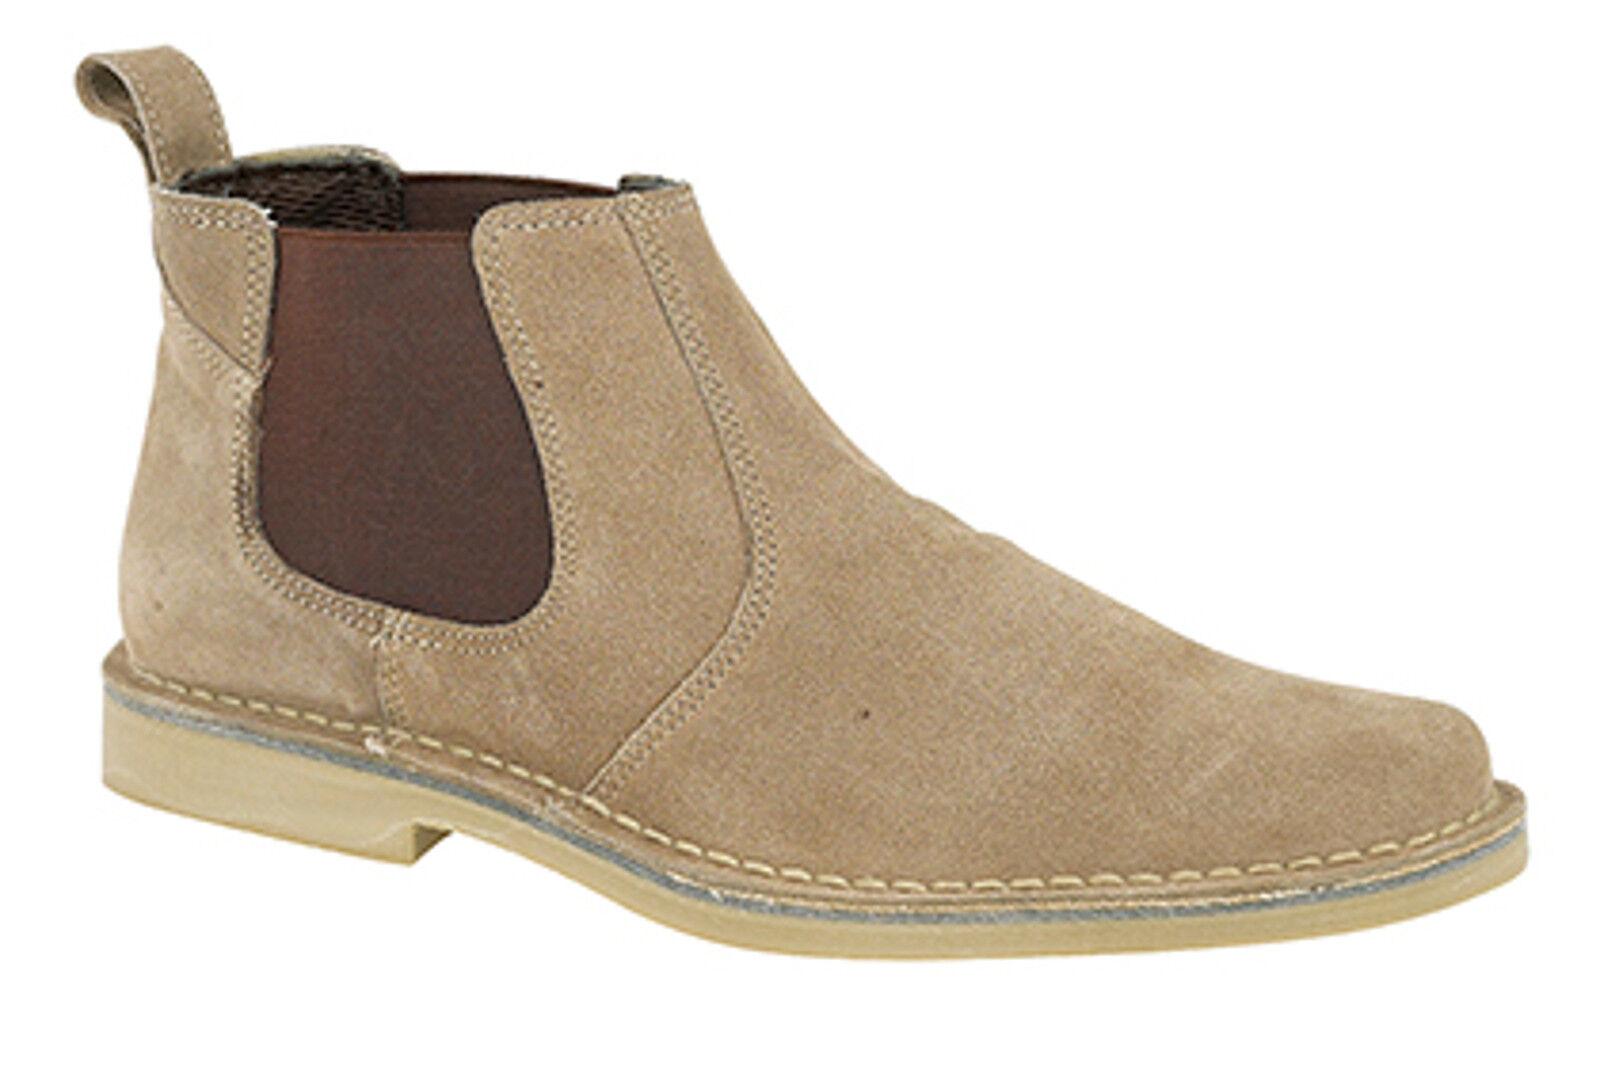 Mens Suede Desert Boots Pull on Slip Sand Dealer Chelsea Boot Size 6 to 12 New